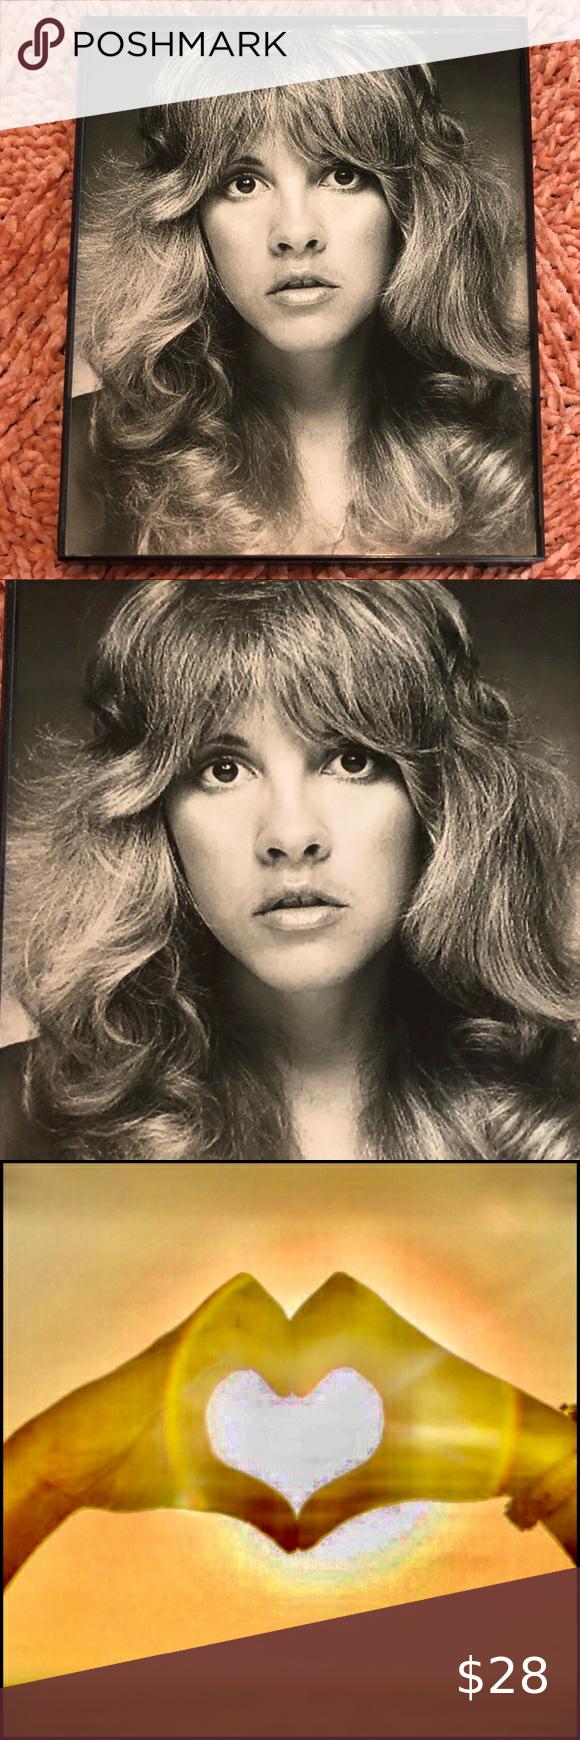 Stevie Nicks 8x10 Framed Photo Beautiful Headshot In 2021 Photo Frame 8x10 Frame Photo